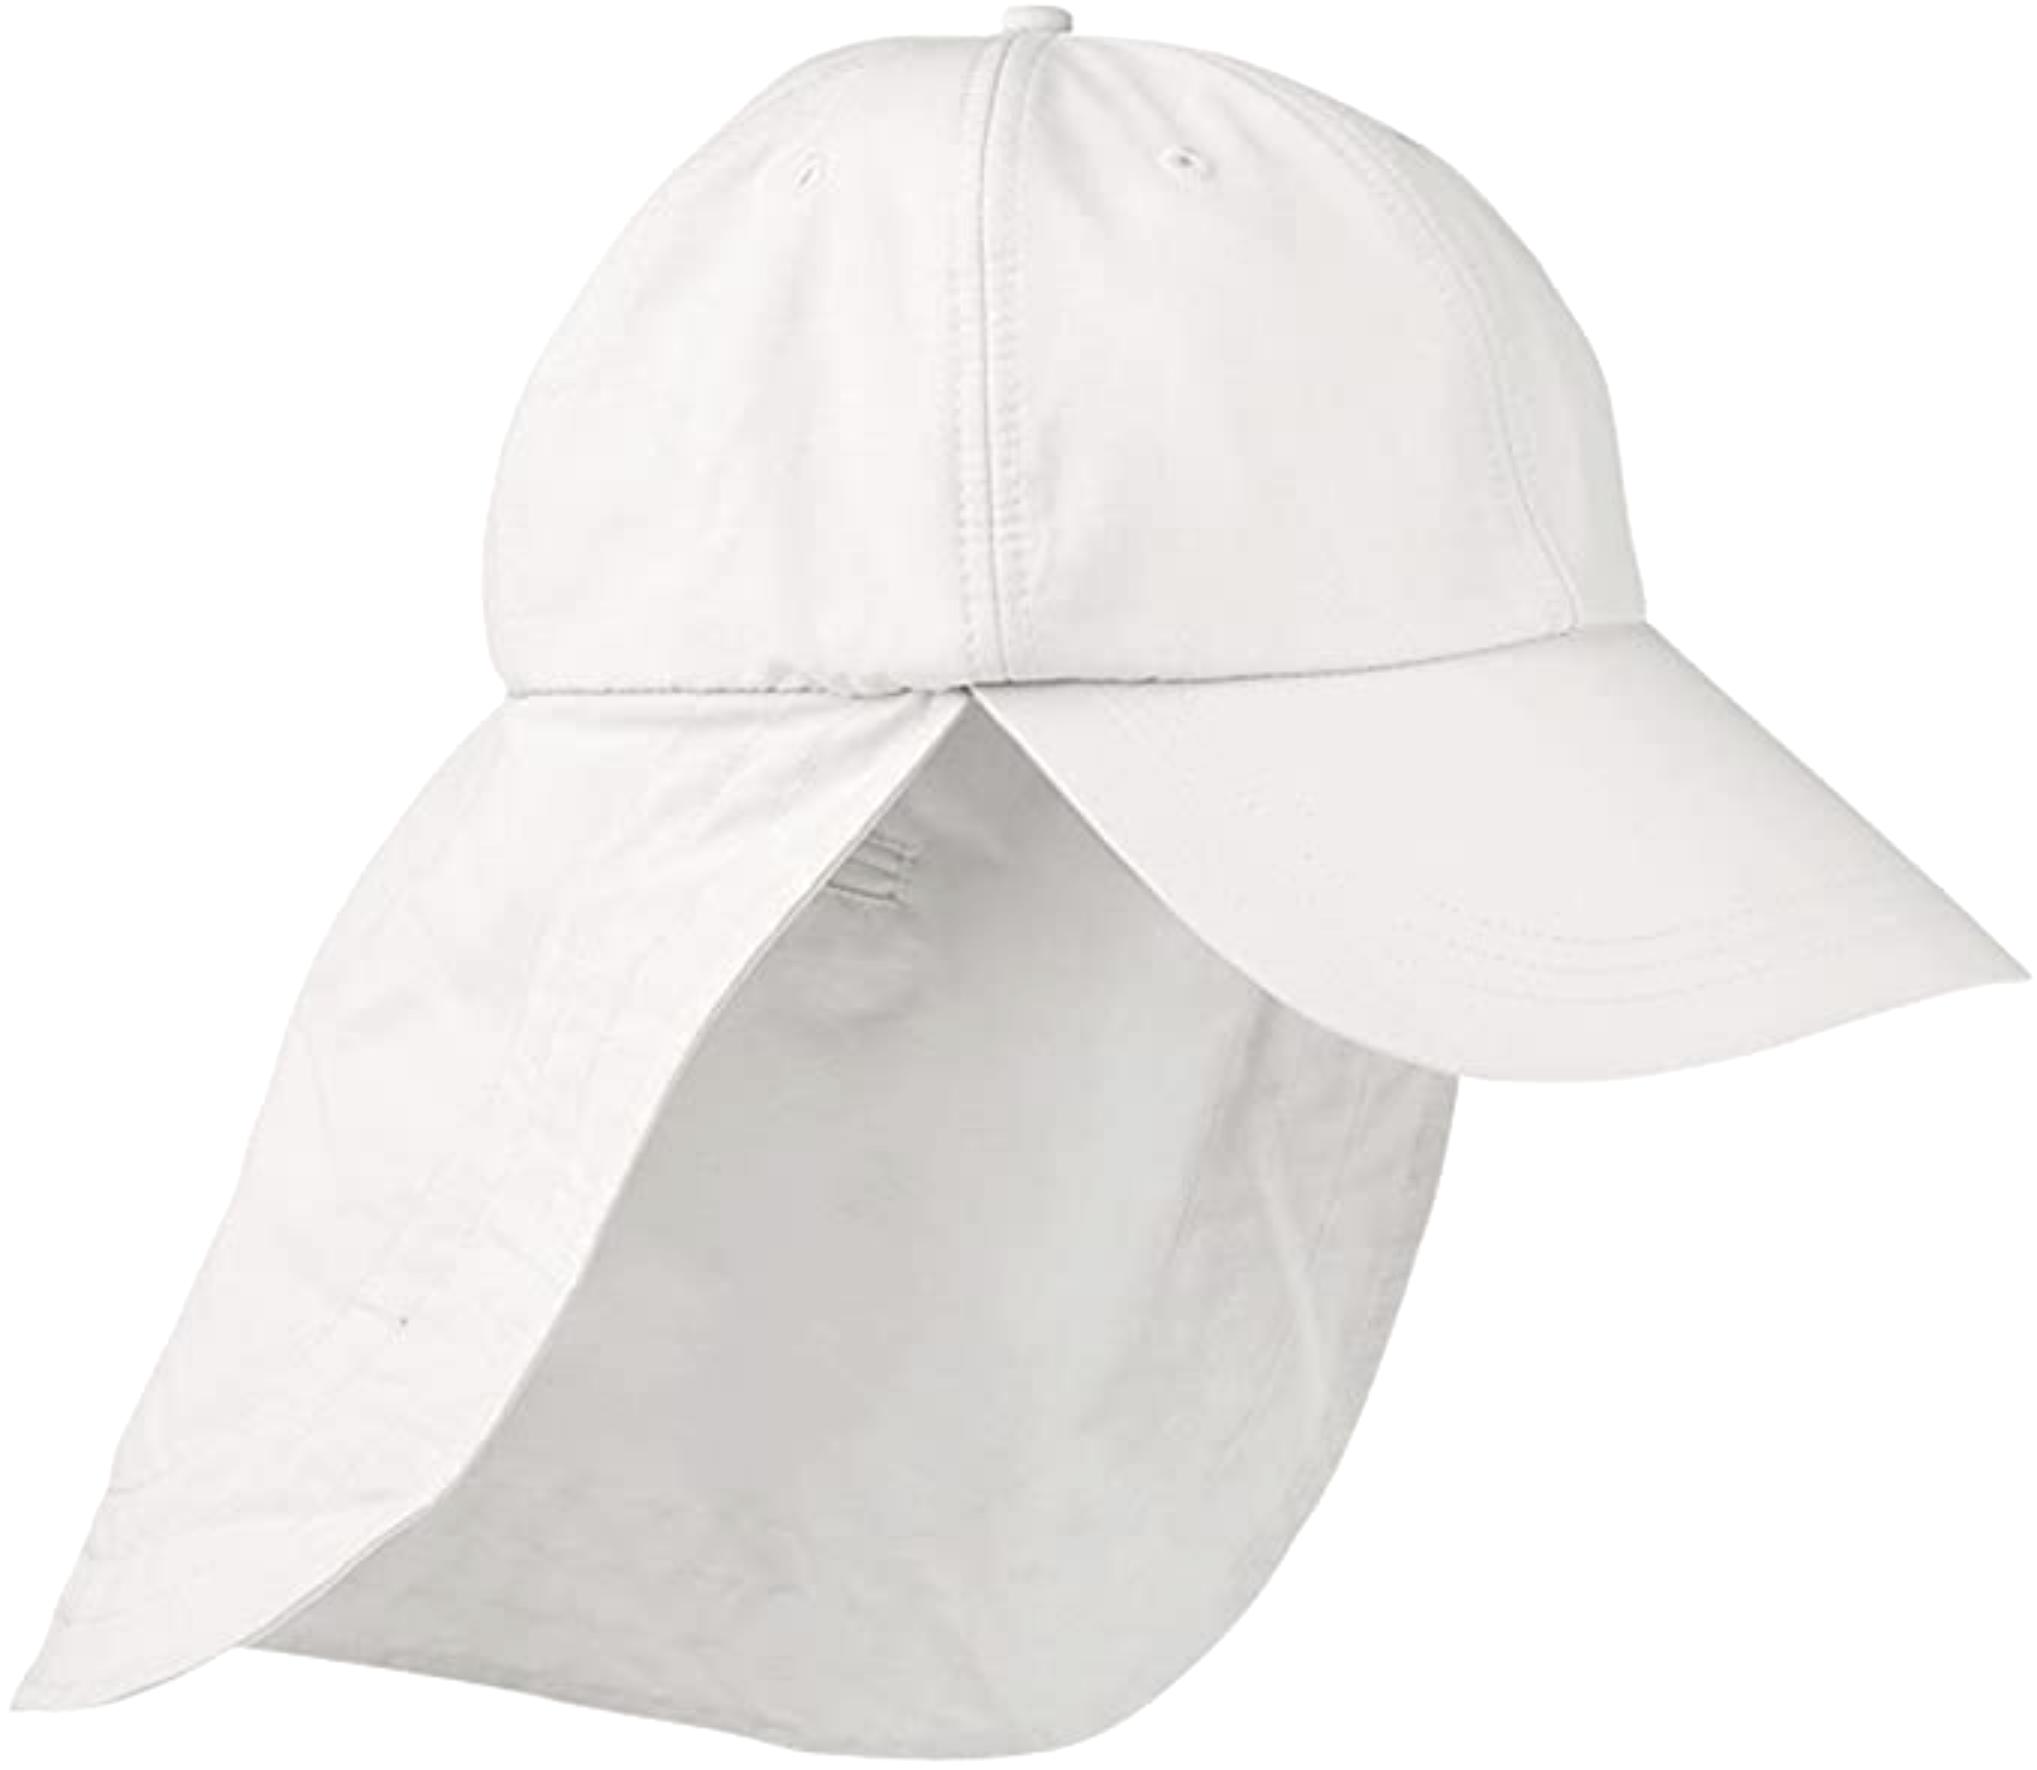 Adams Lightweight UV Nylon Cap with Cape White